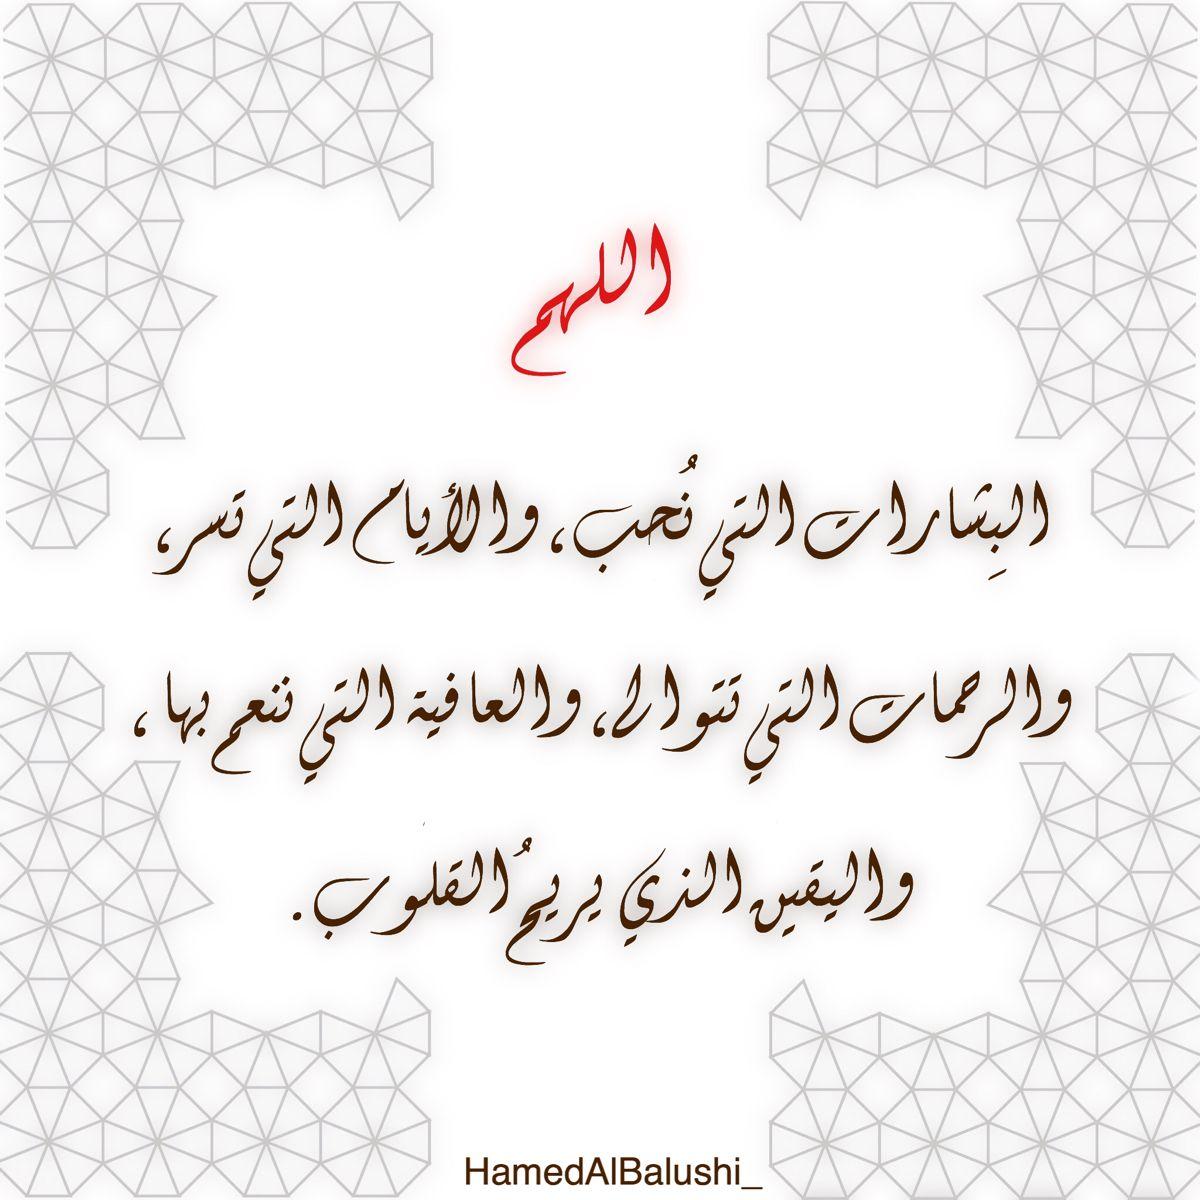 البشارات Calligraphy Arabic Calligraphy Art